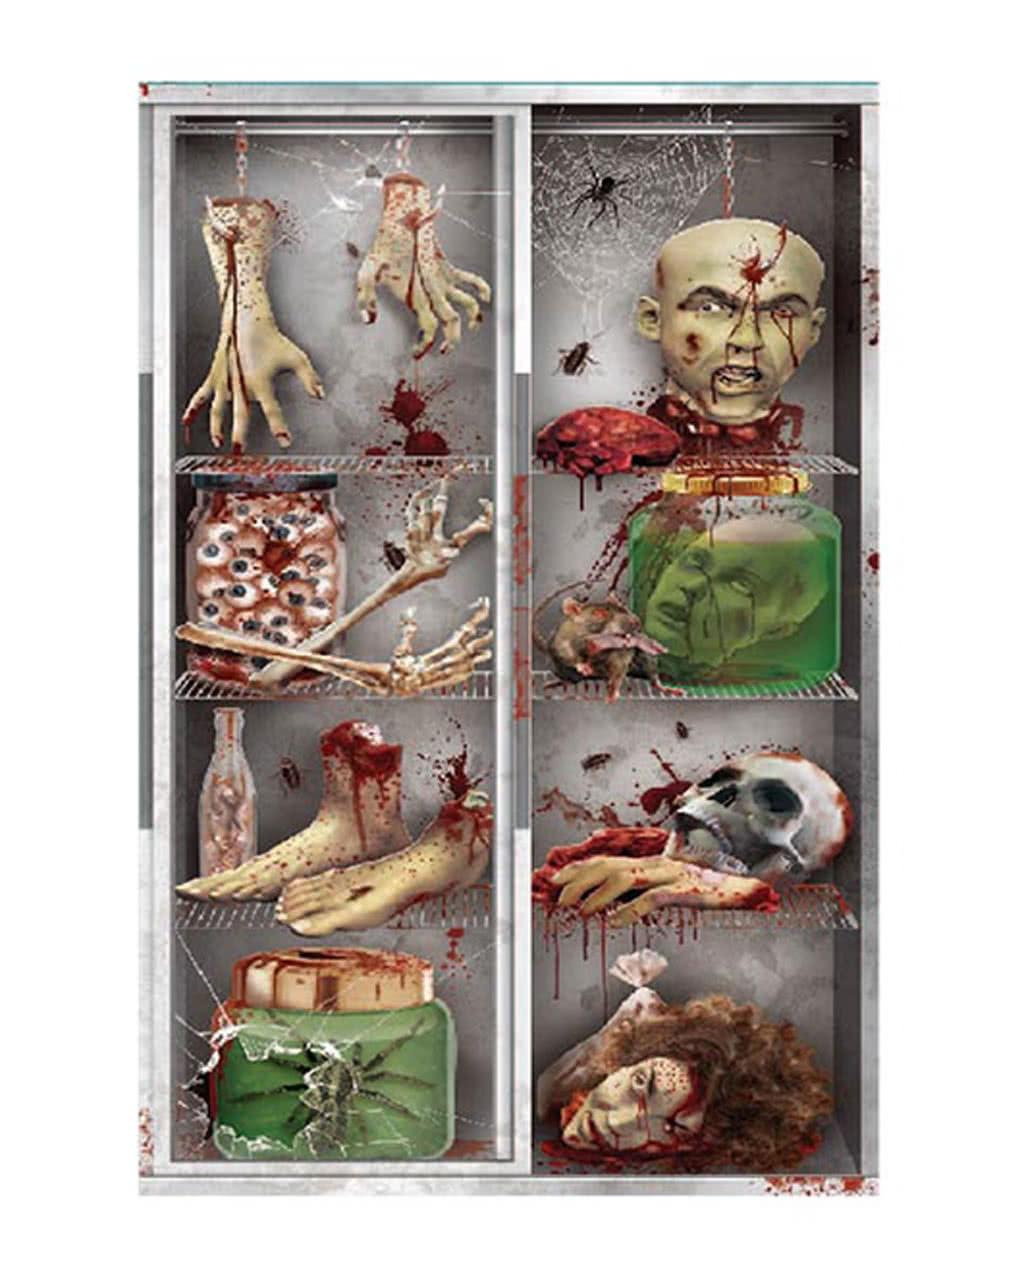 Kühlschrank Deko.Halloween Türfolie Körperteile Im Kühlschrank